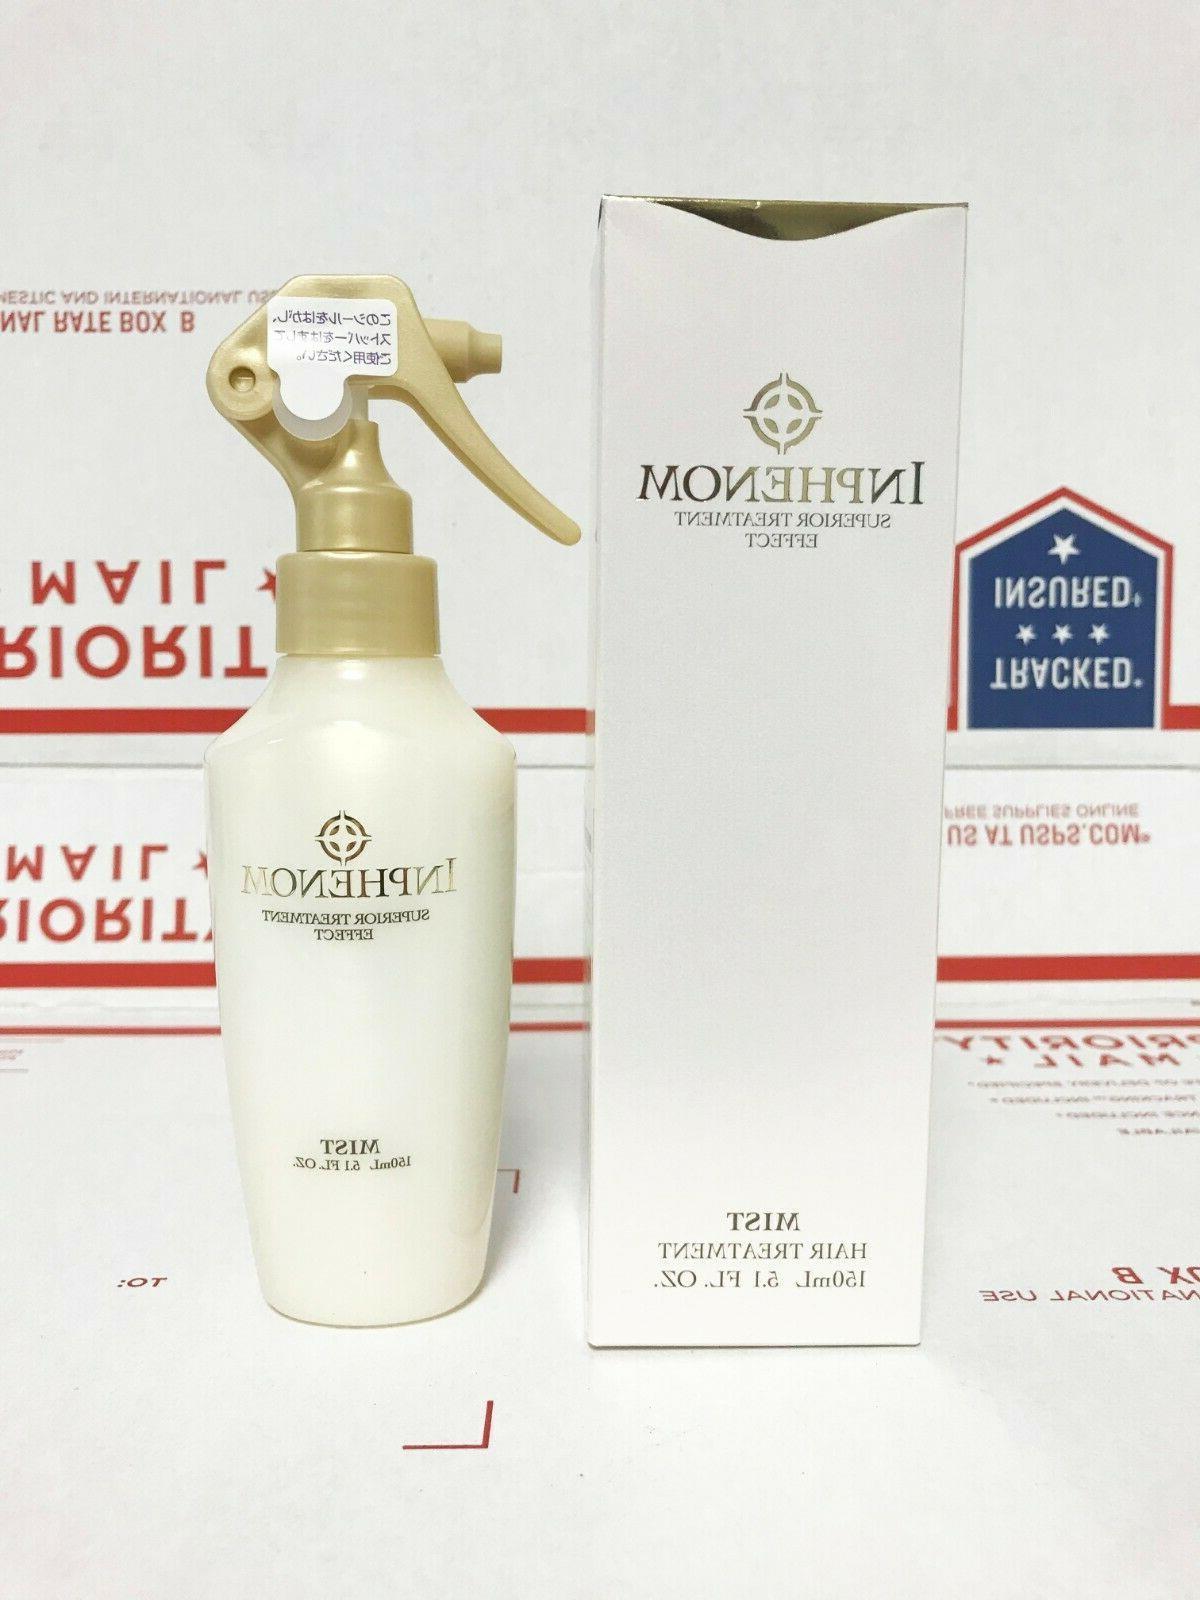 inphenom mist hair treatment 5 1 oz